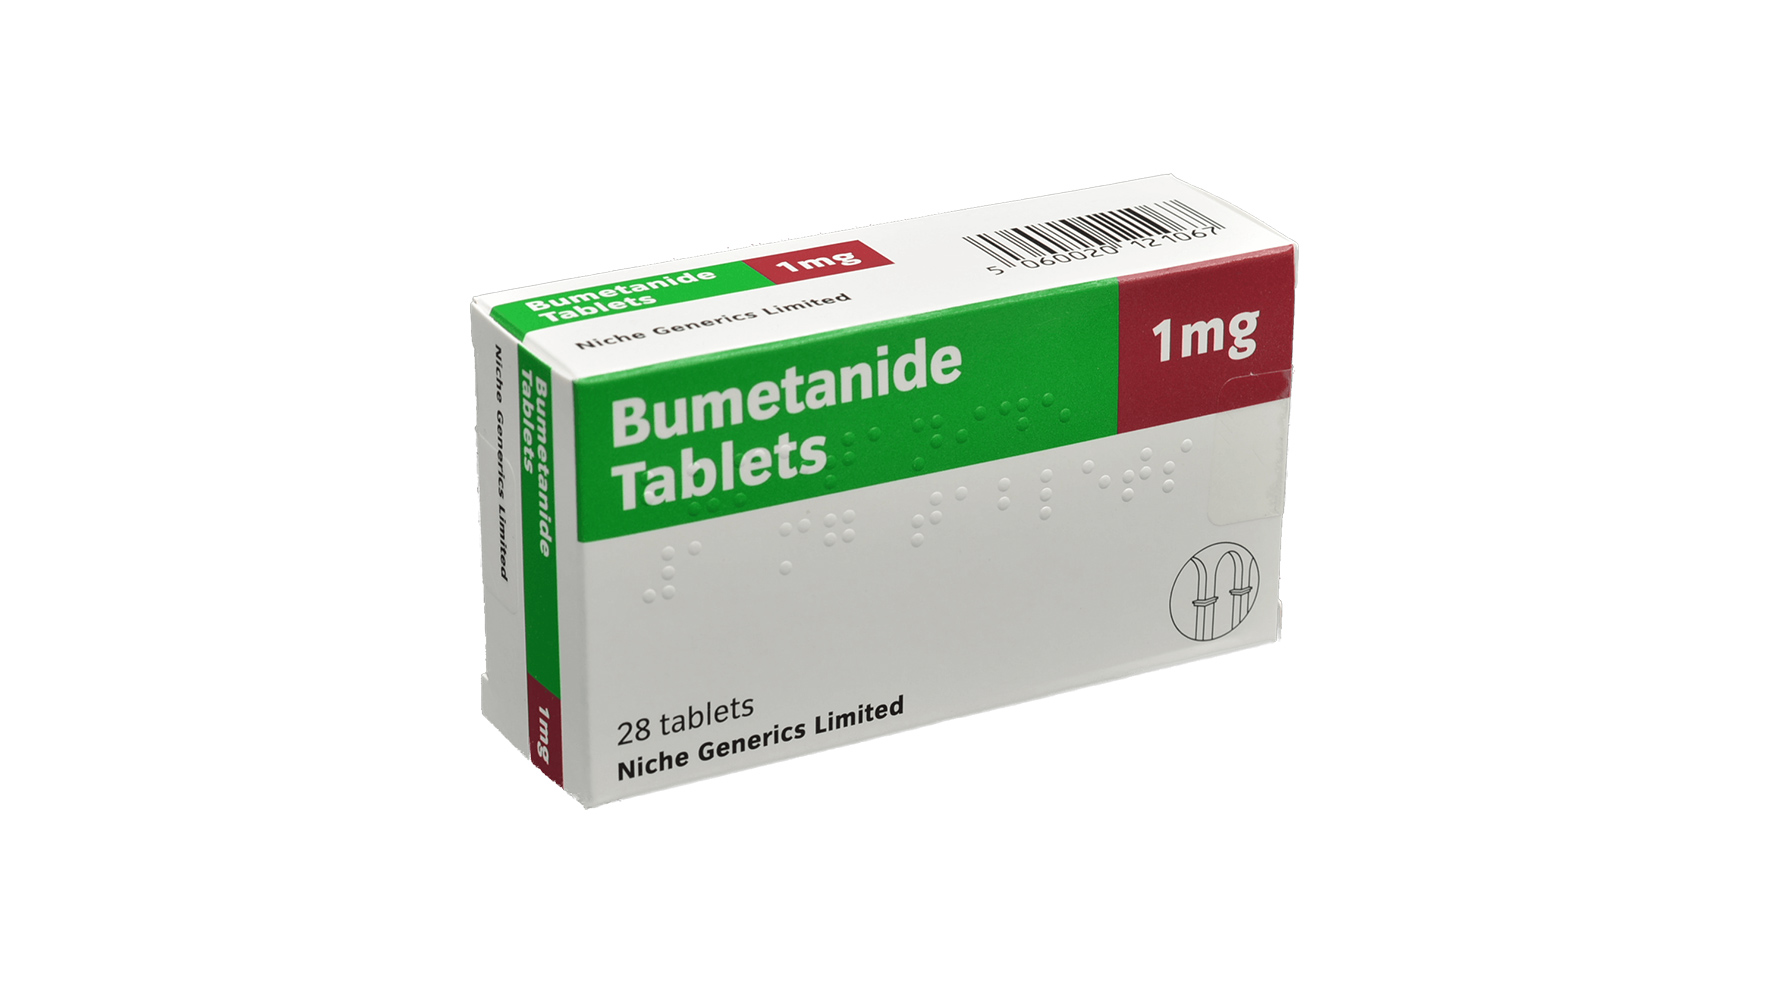 bumetanide for bodybuilding